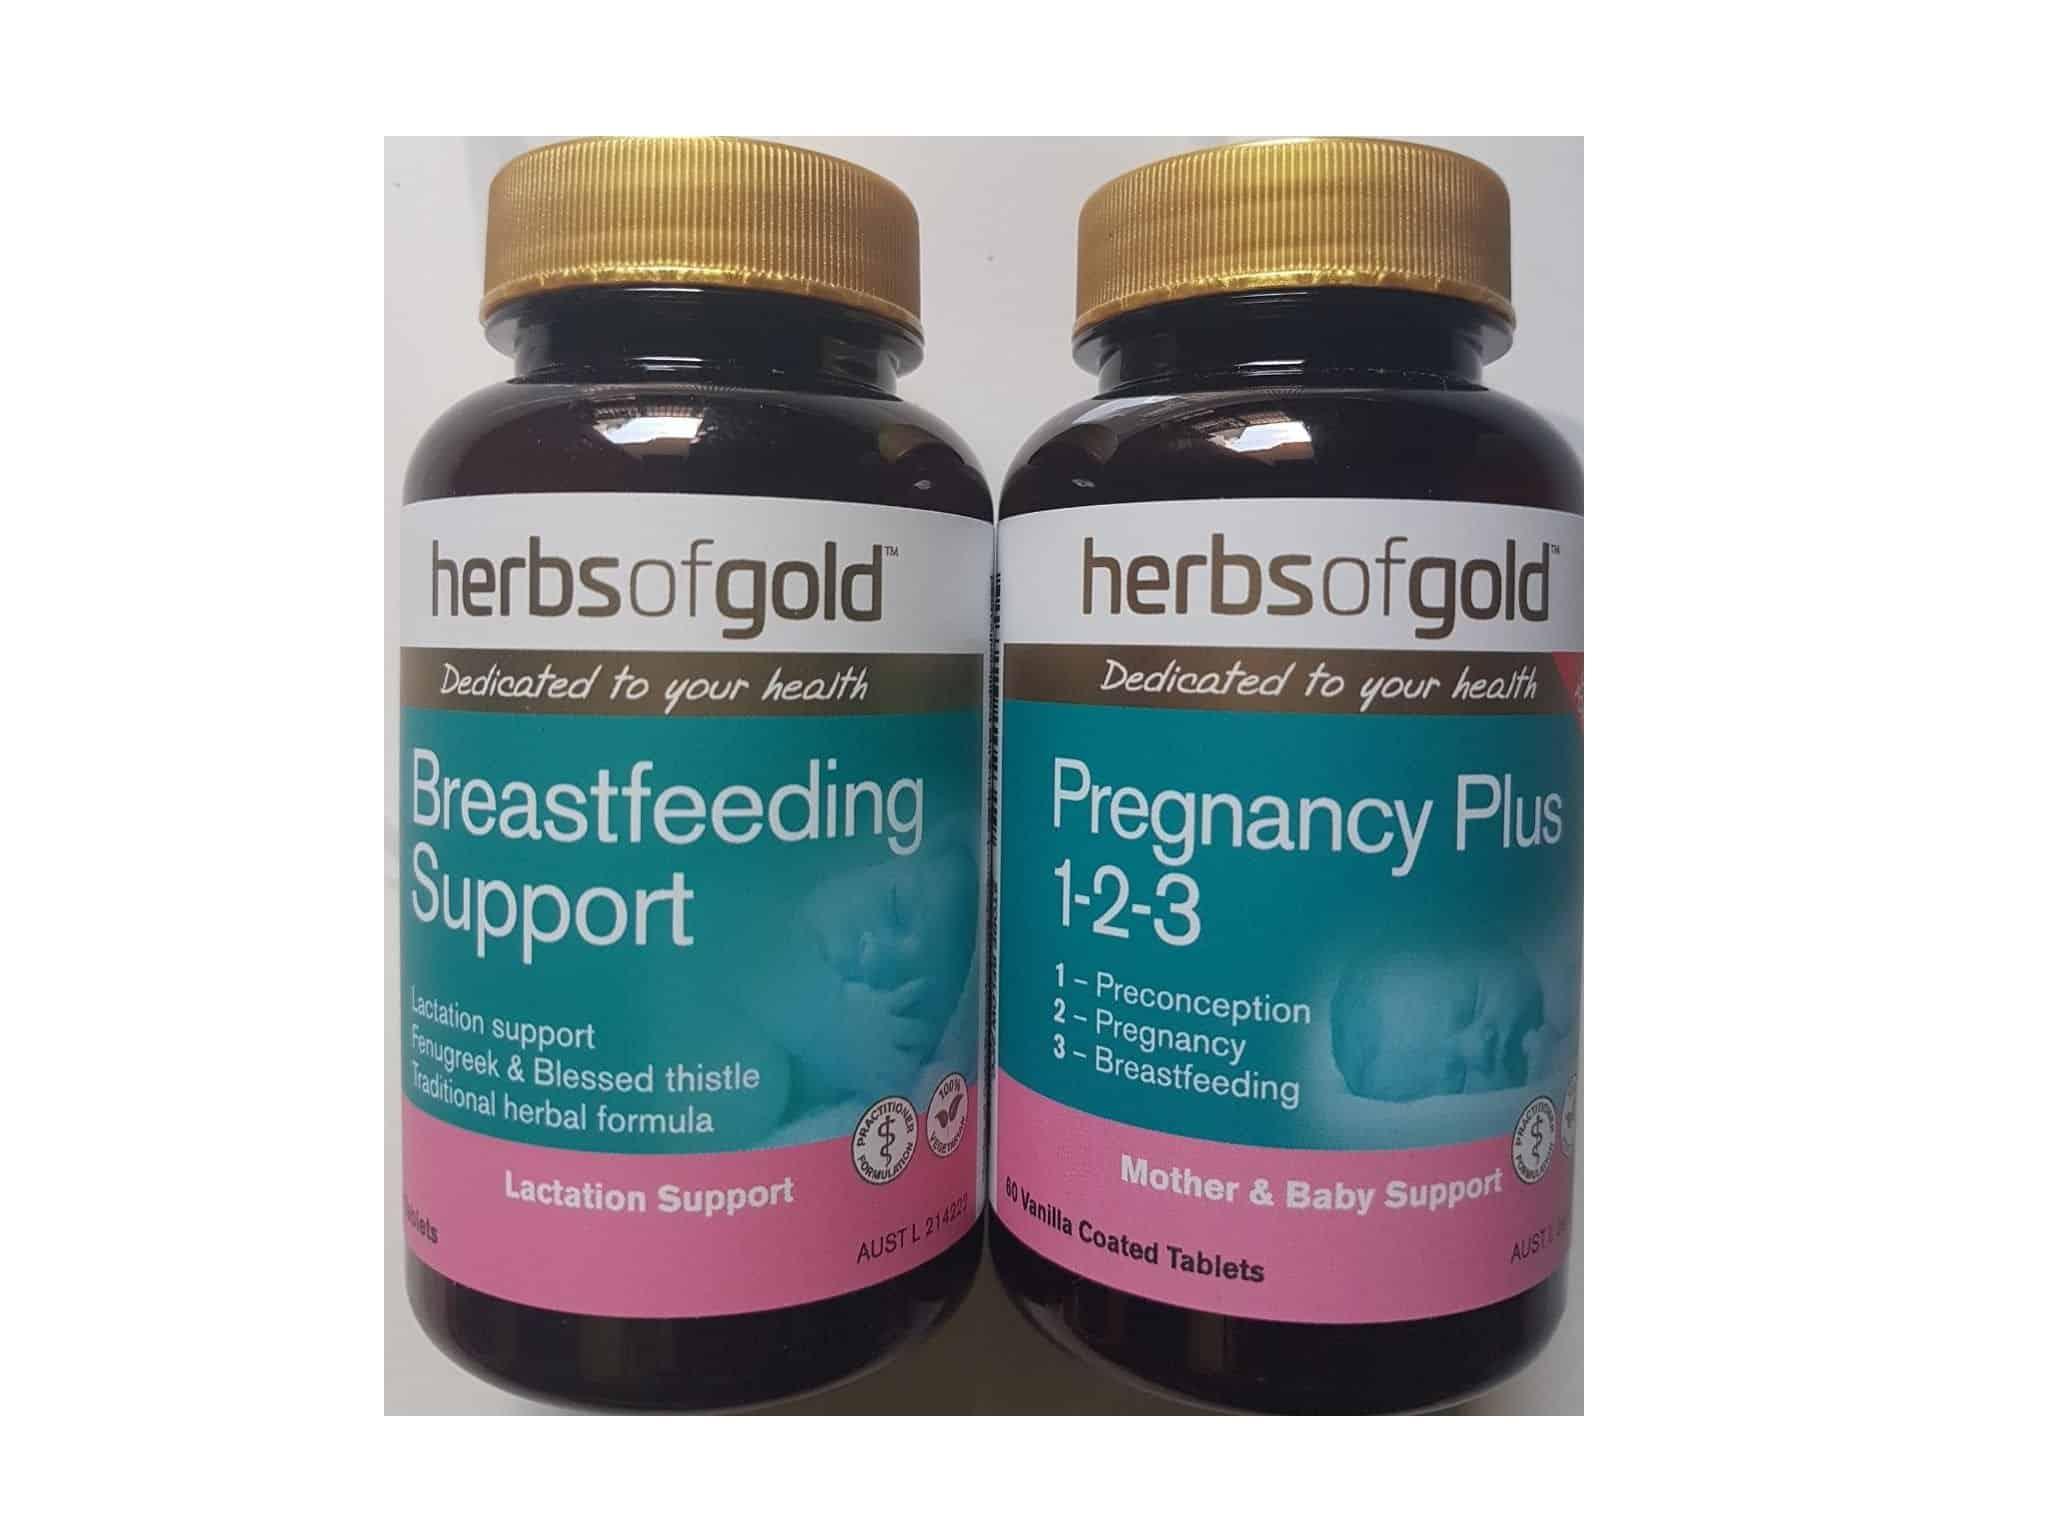 Herbs-Of-Gold-Pregnancy-Plus-Breastfeeding